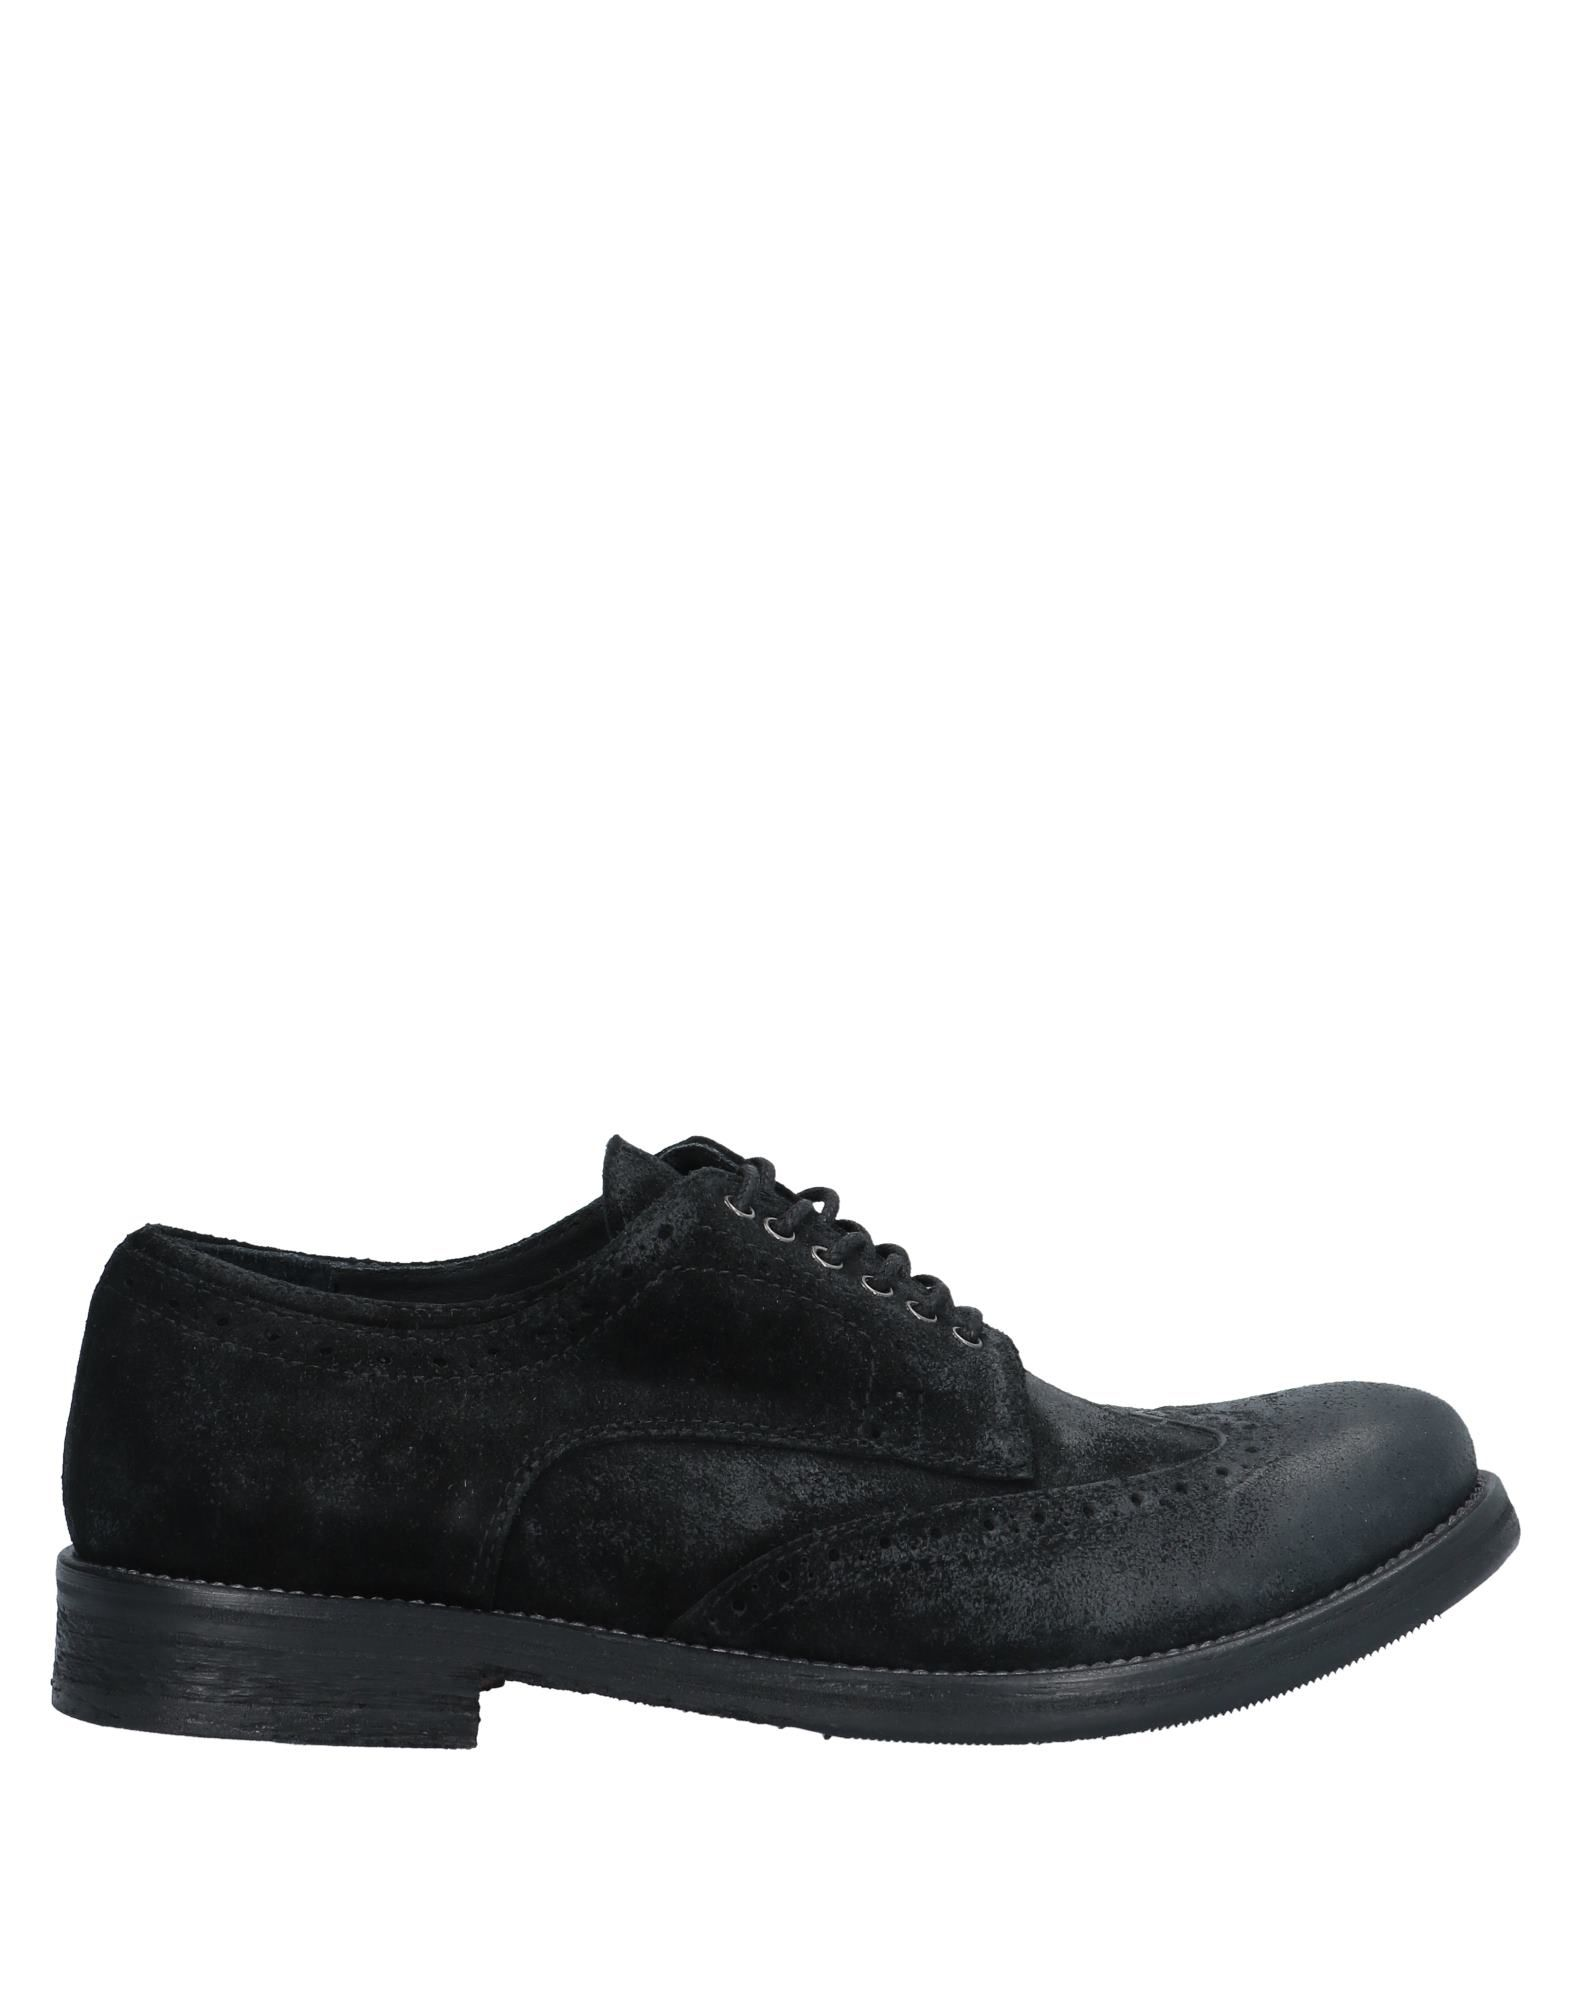 MARCEL MARTILLO Обувь на шнурках цена